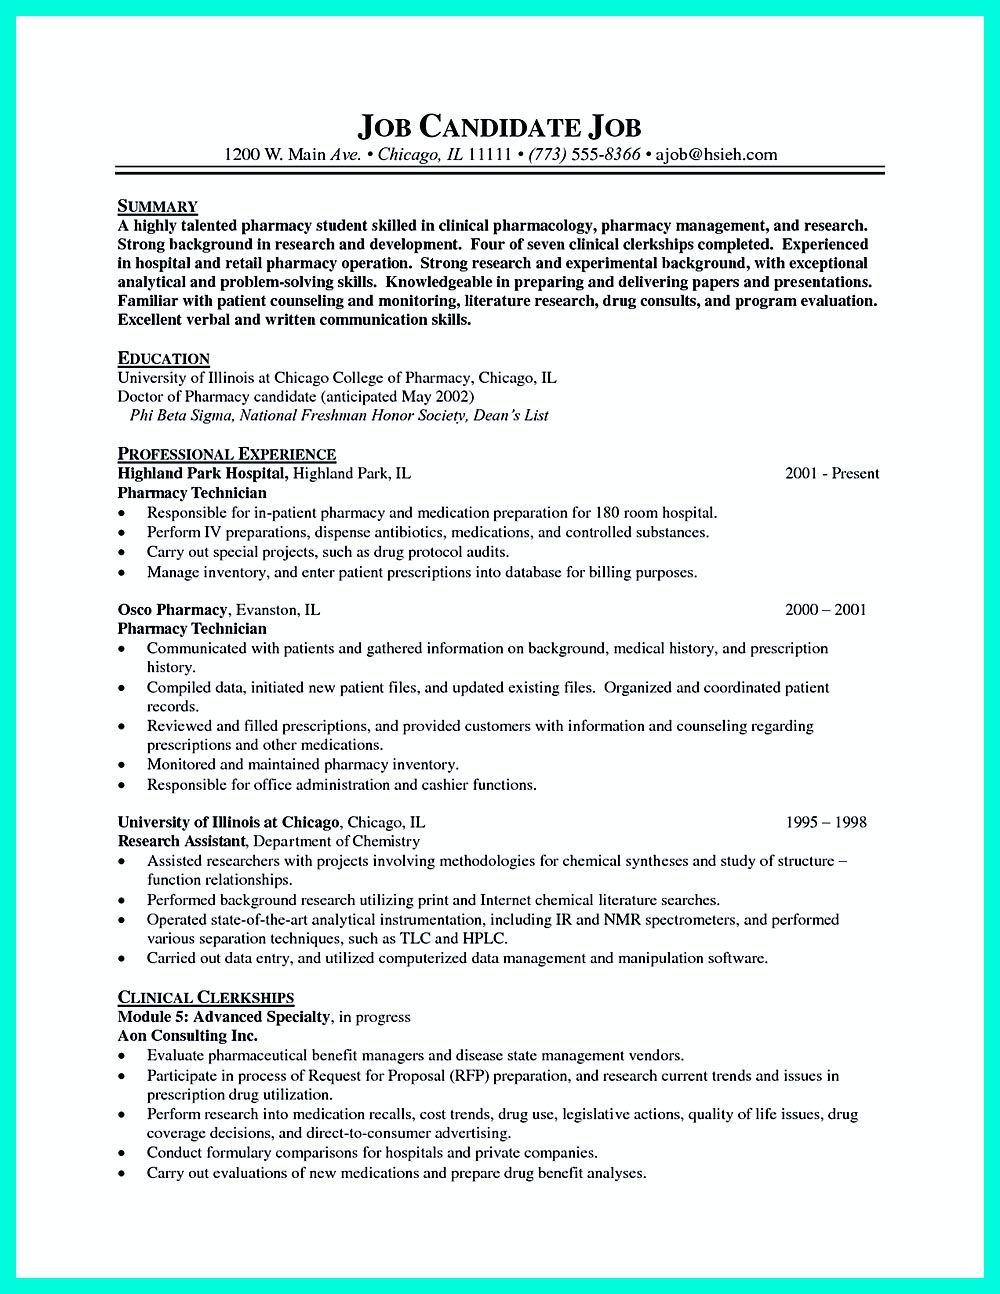 Research Technician Resume